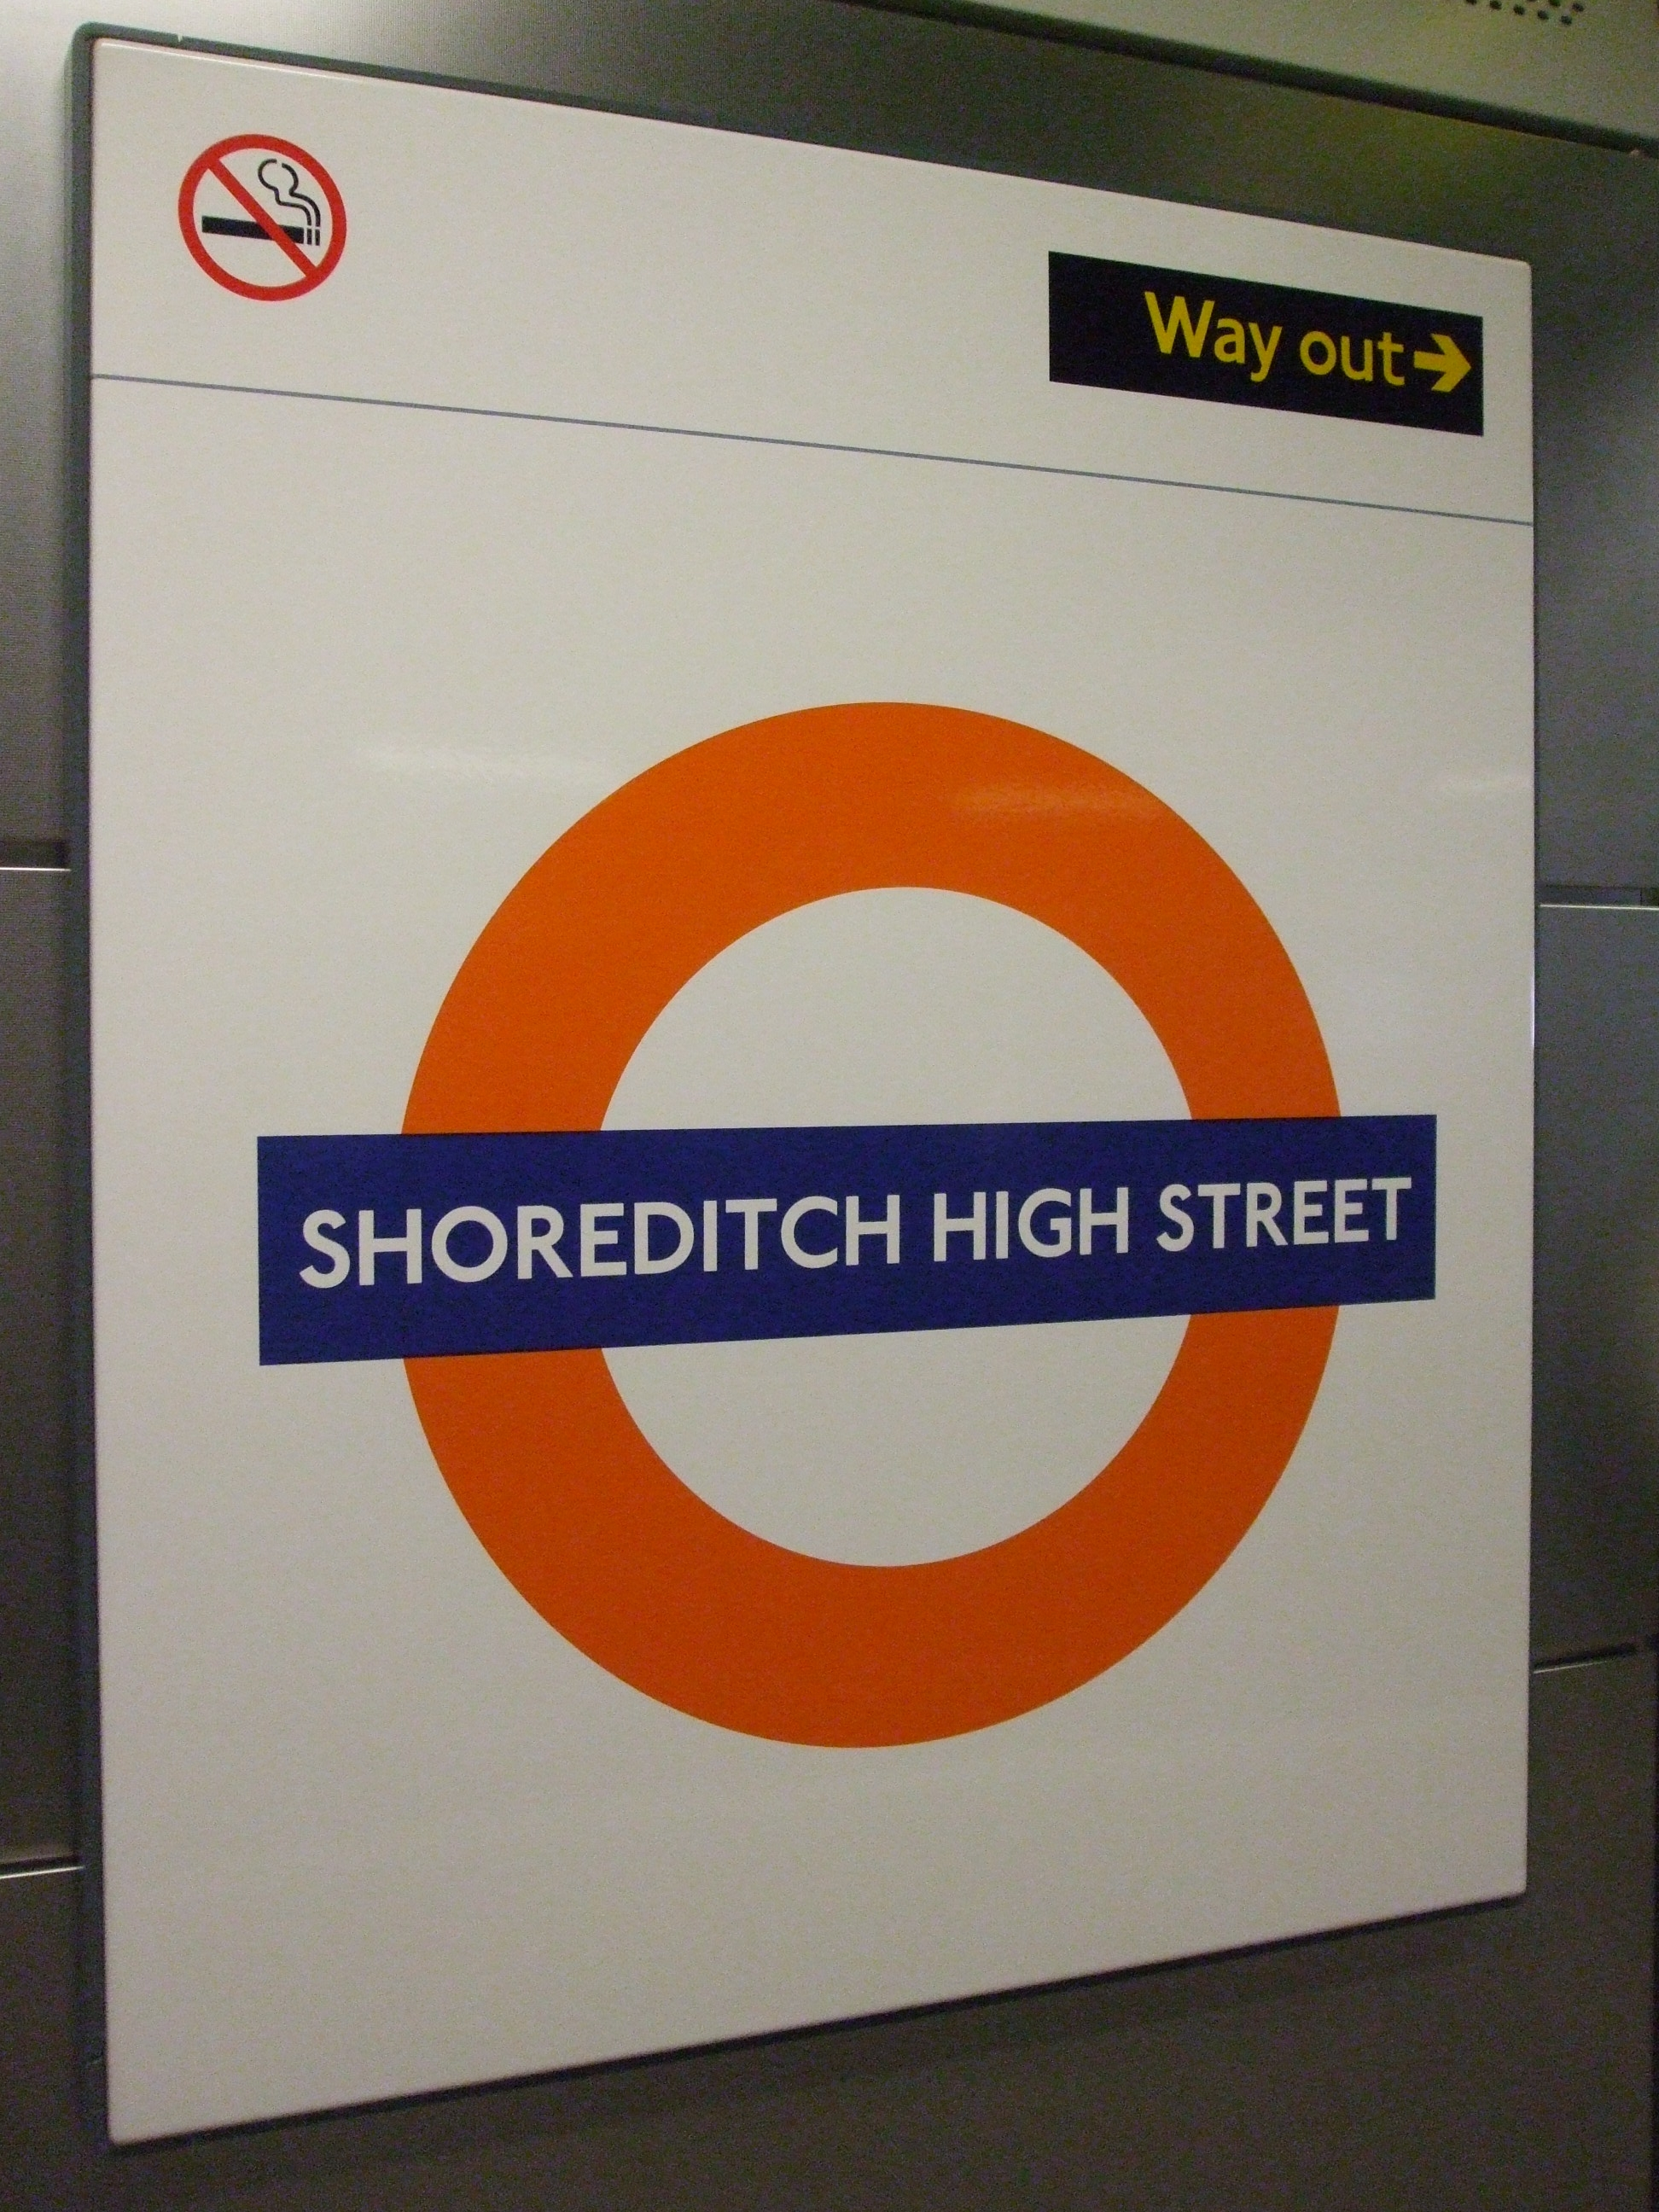 Shoreditch Station: File:Shoreditch High Street Stn Roundel.jpg